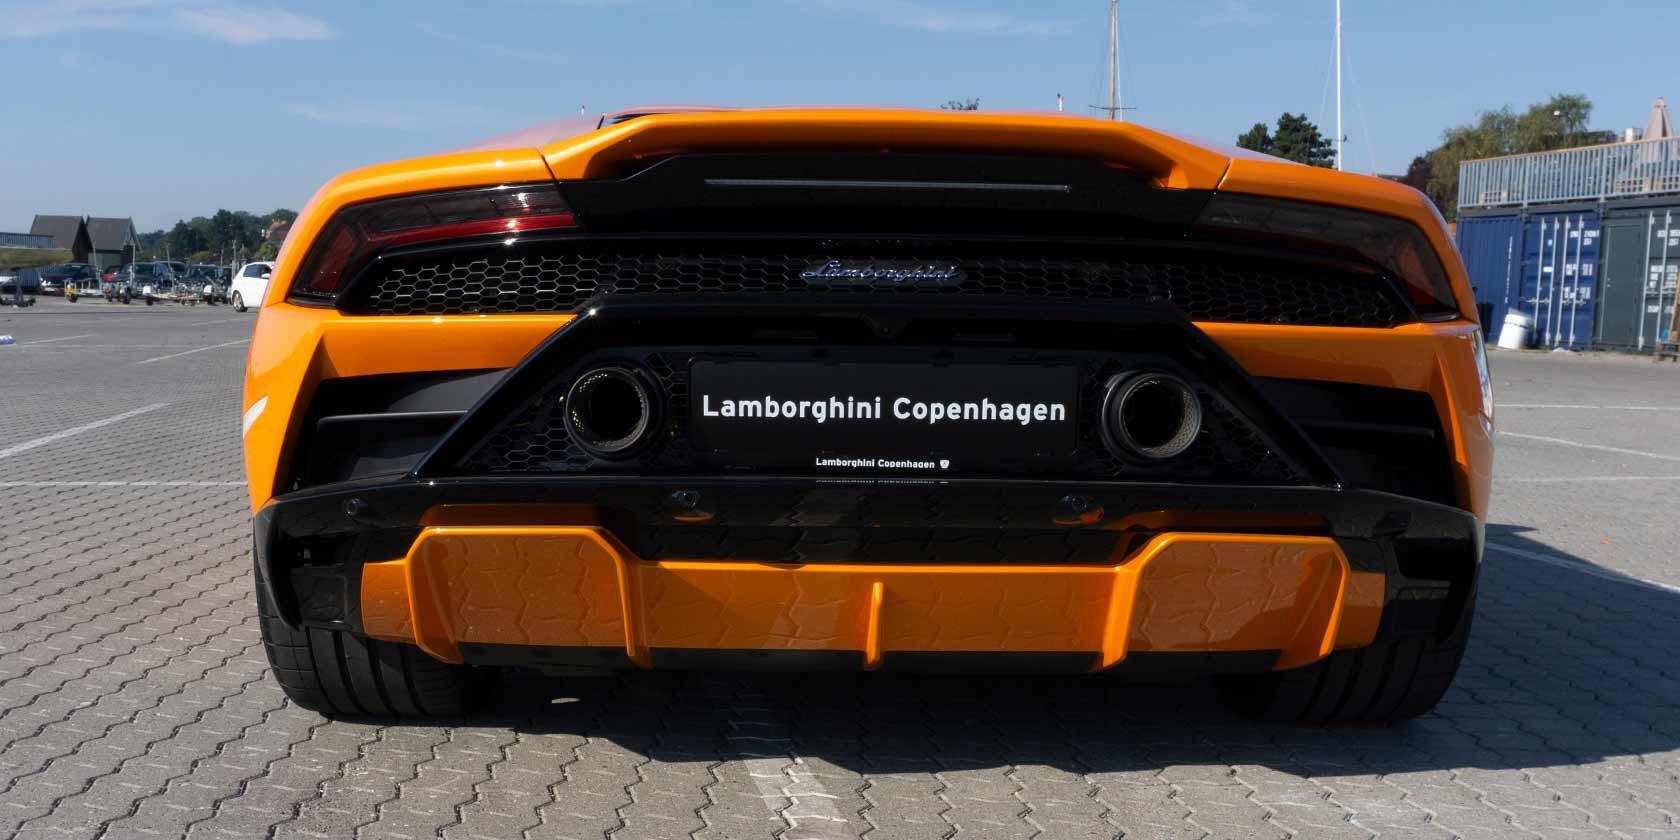 KAUFMANN_1680x840_Lamborghini_thejournal_06.jpg